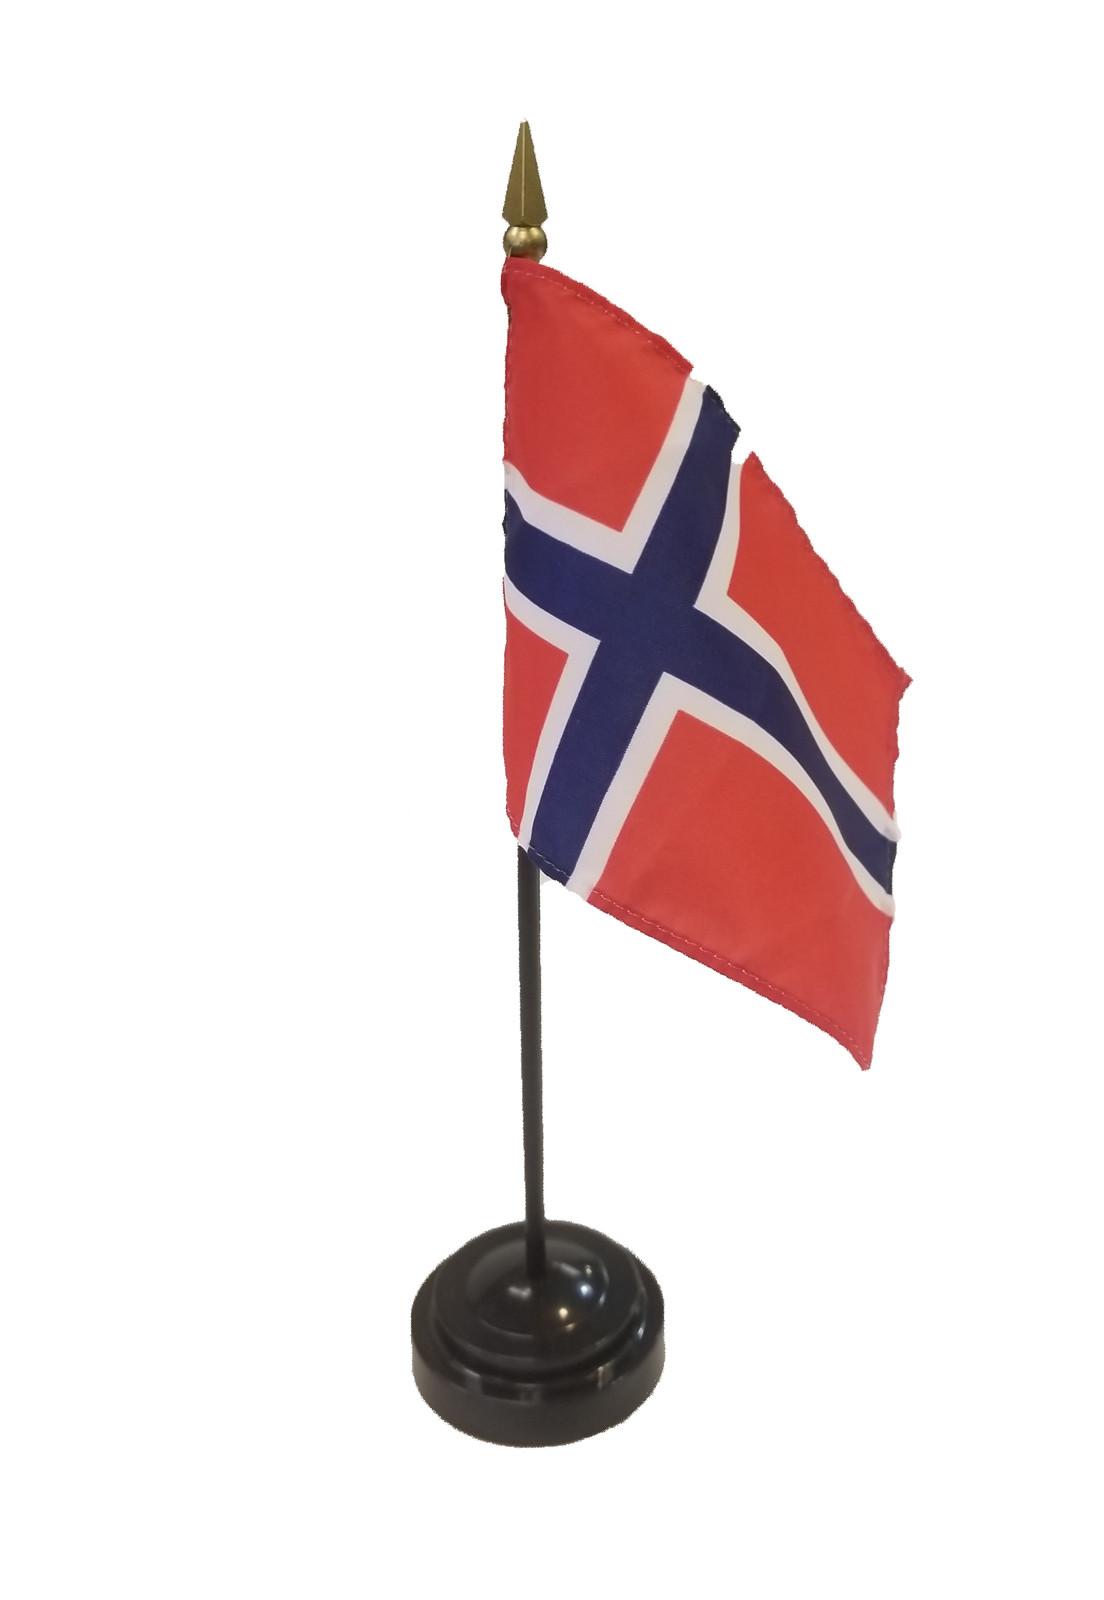 Norwegian Tabletop Flag (20190619-01)